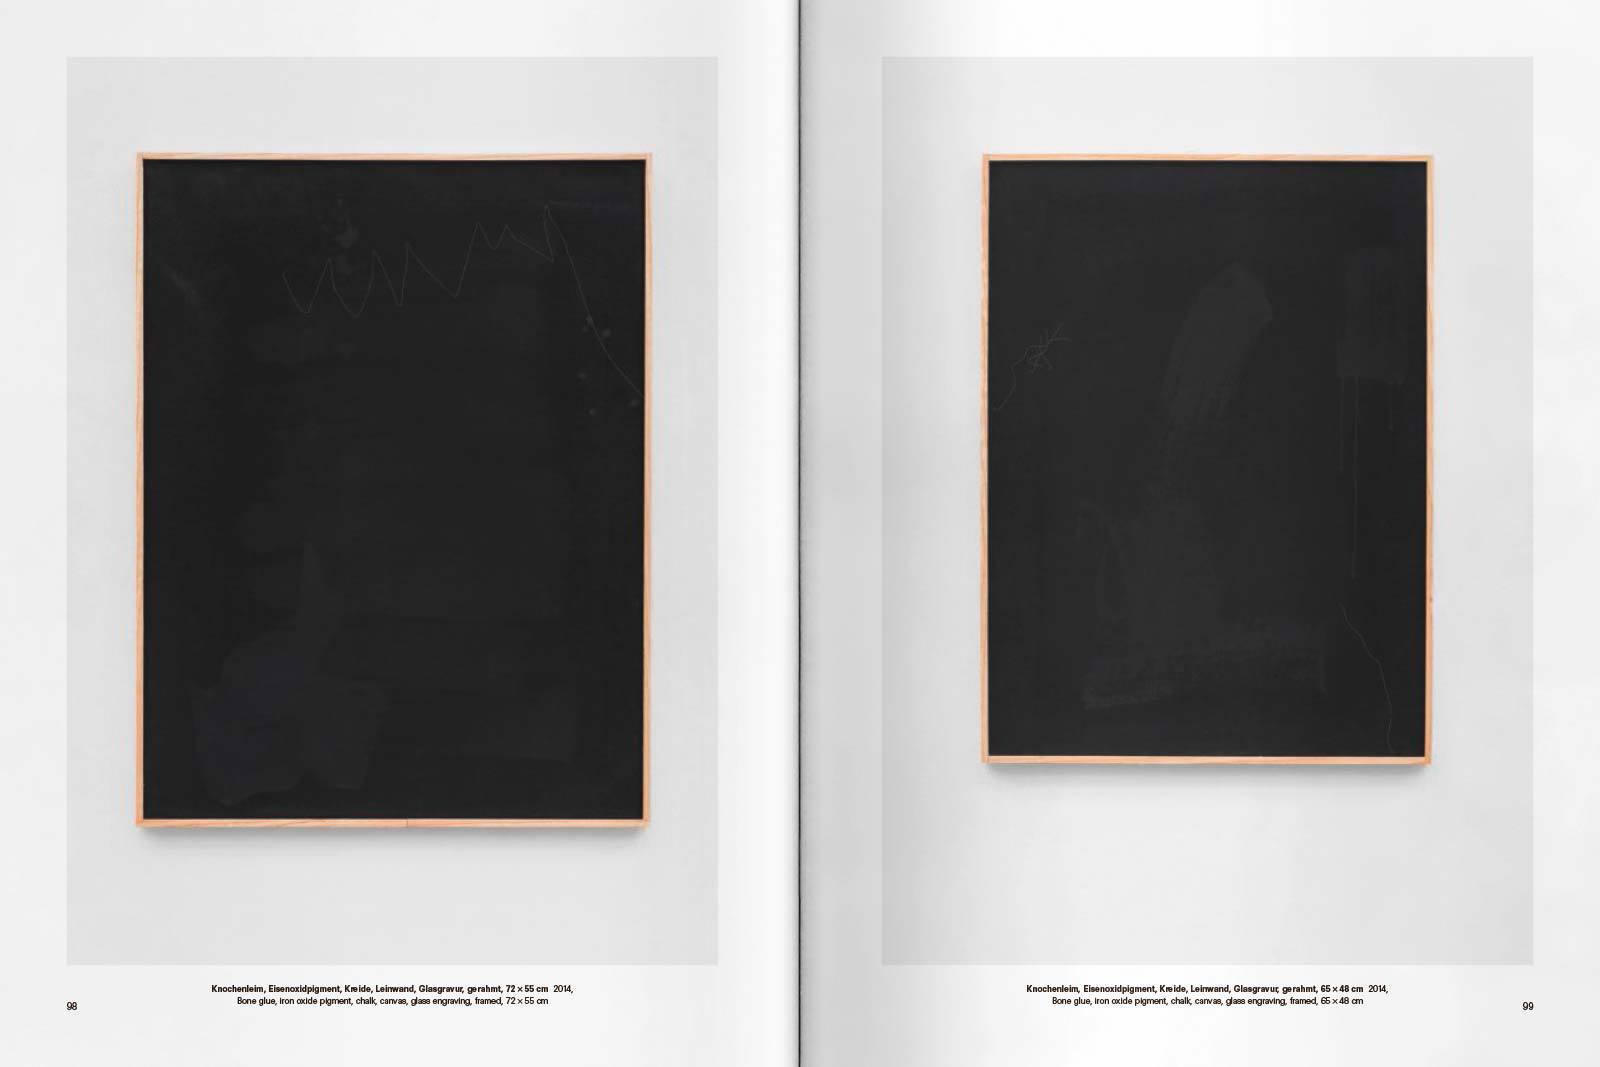 Faber Castell Preis spread19